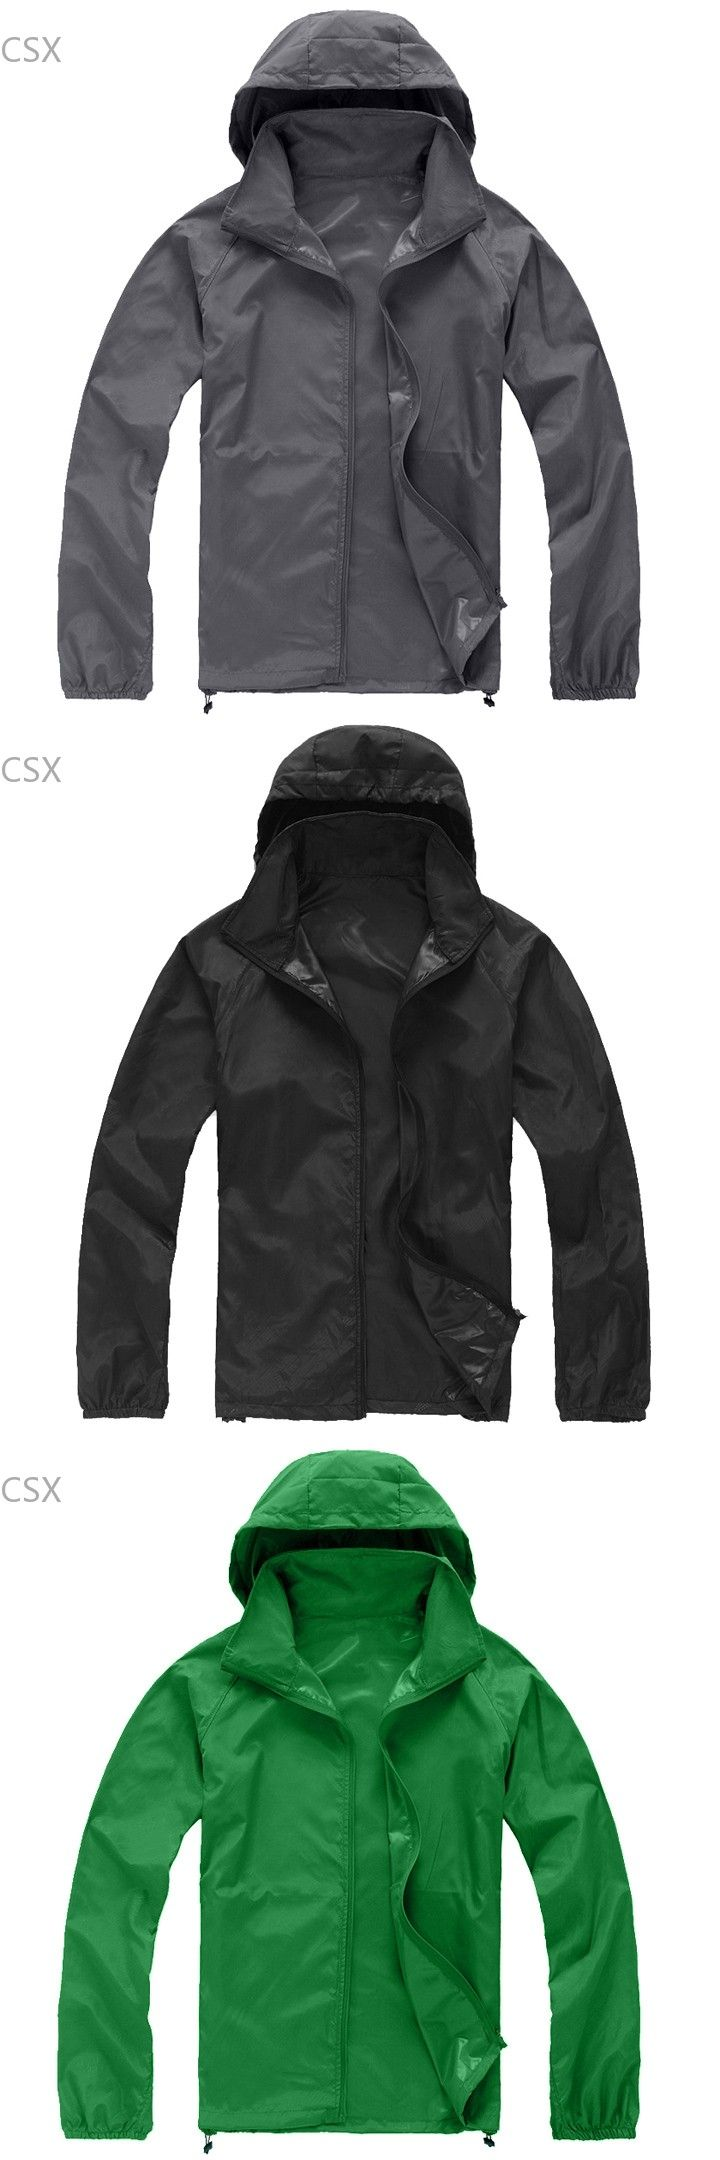 2016 New Men Women Raincoat Protective Clothing Coat Waterproof Jacket For Unisex Windbreaker sun protective clothing 41